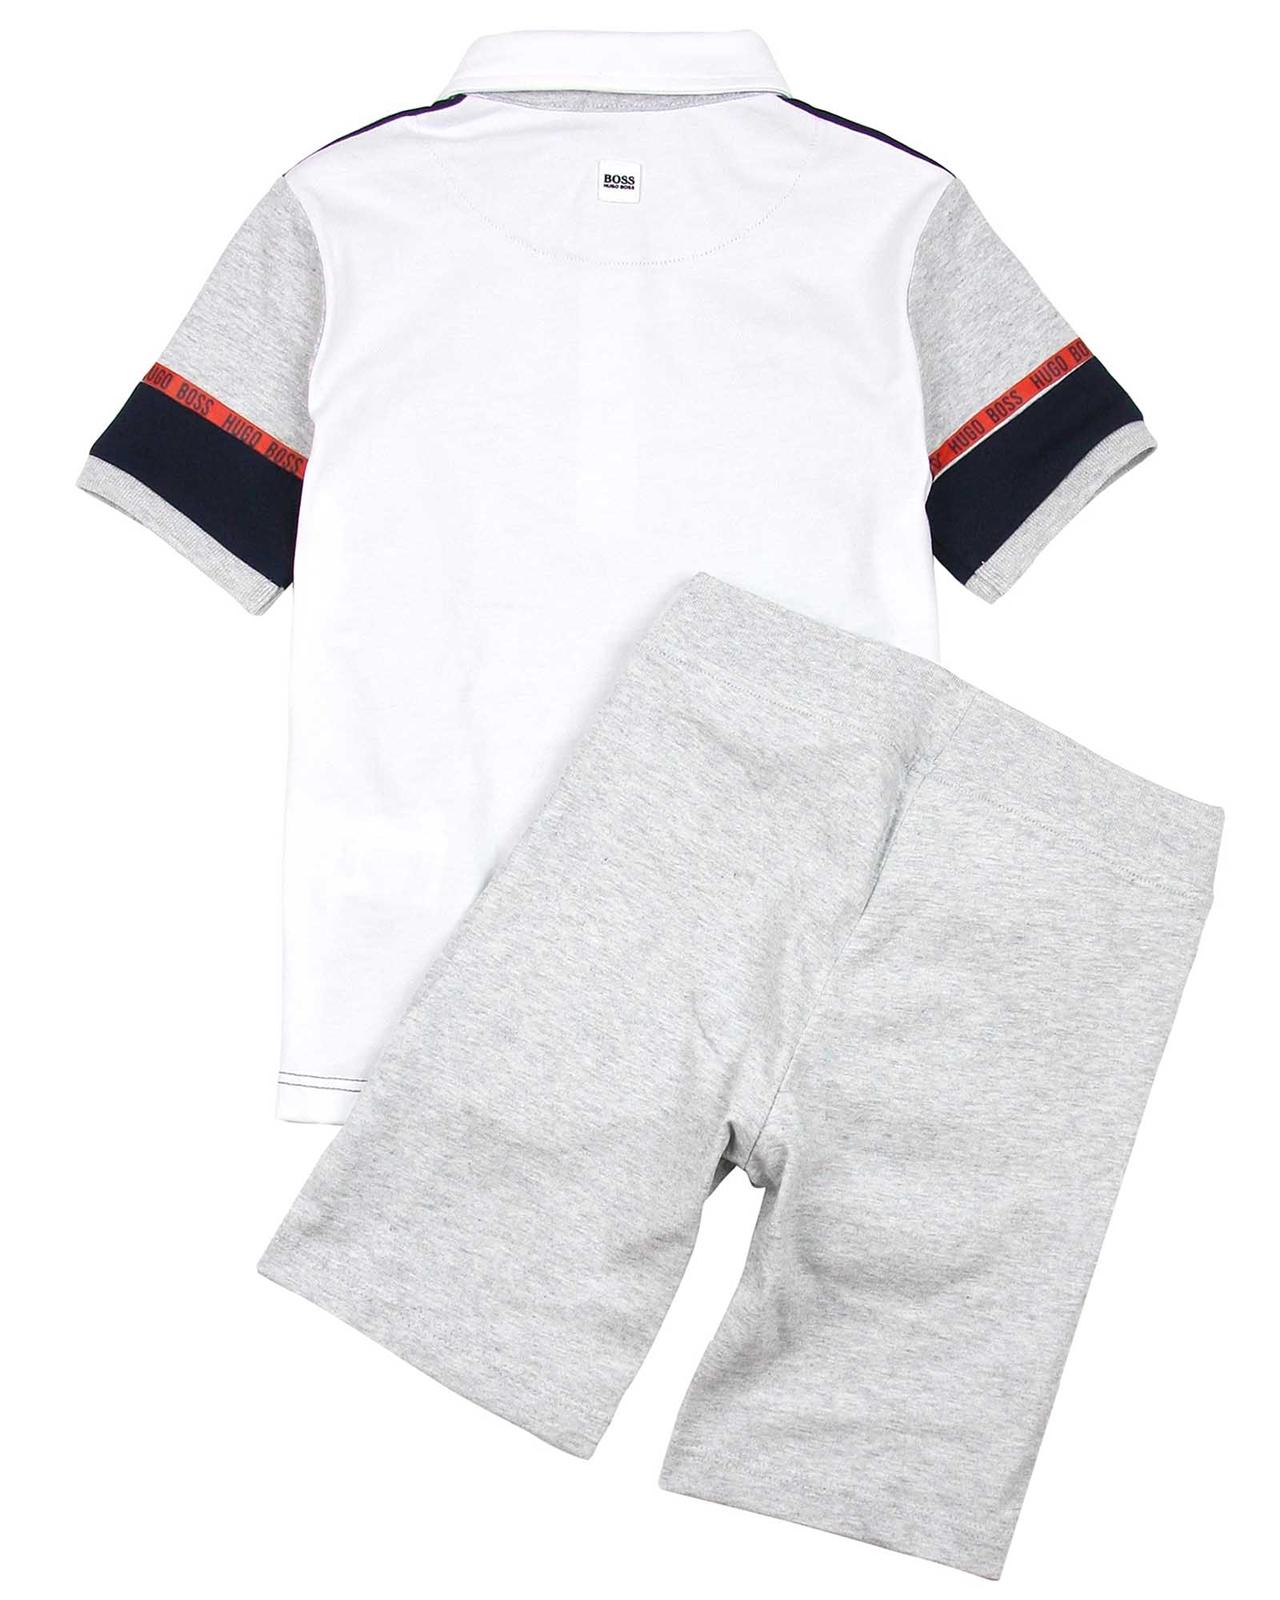 73d862058 BOSS Boys Polo and Bermuda Shorts Set - BOSS - BOSS Boys Clothes ...